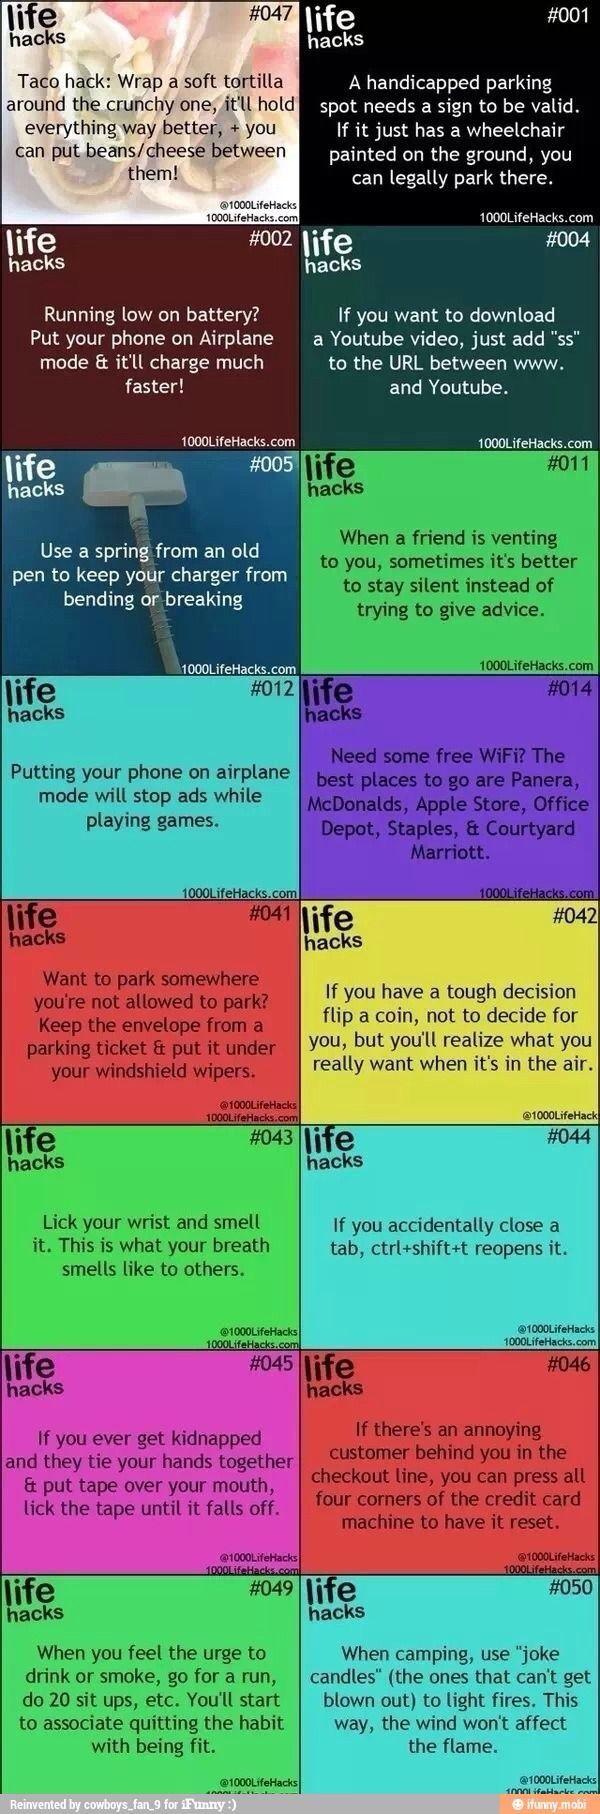 16 Life Hacks